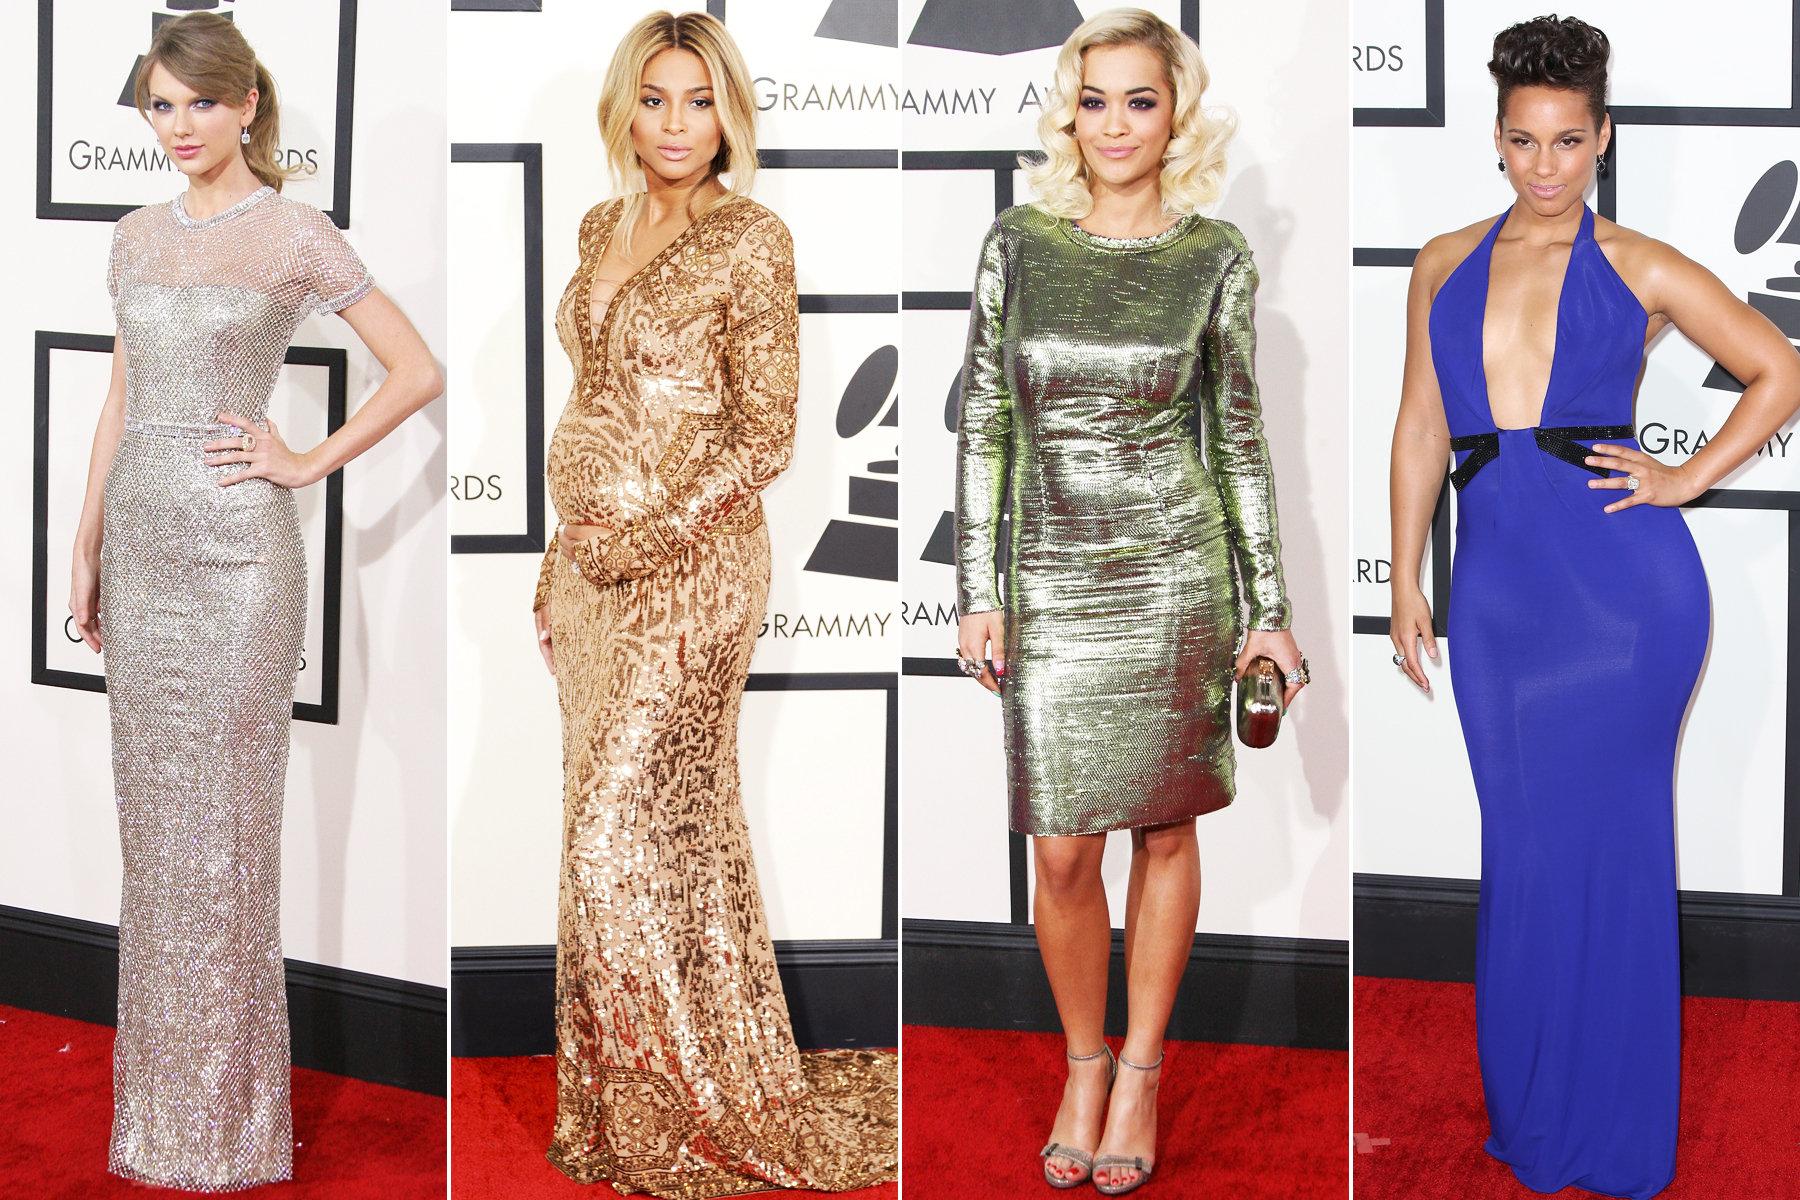 2014 GRAMMYs dresses